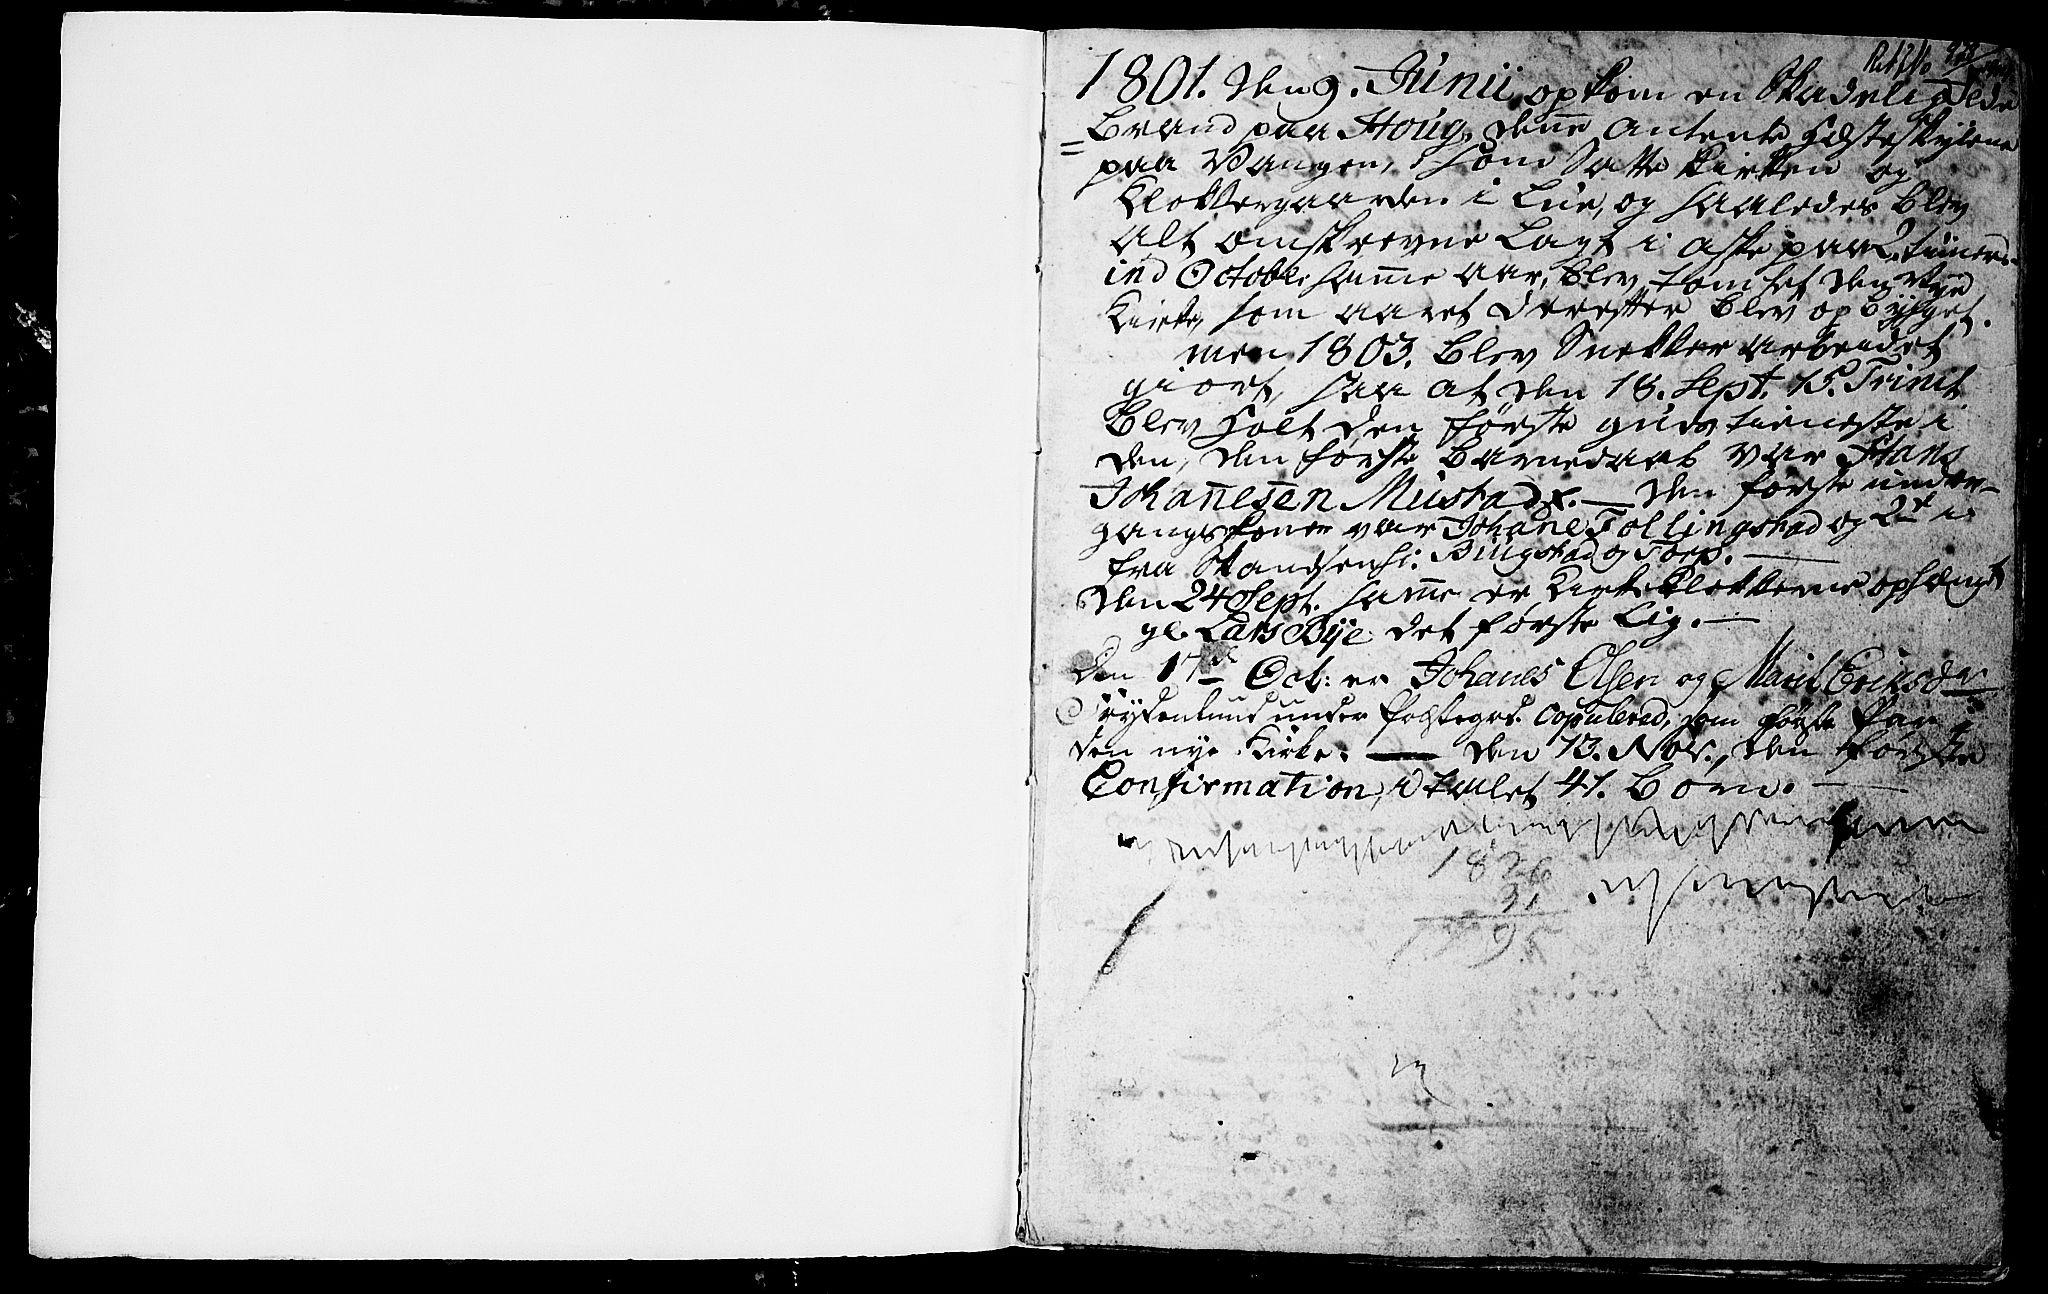 SAH, Vardal prestekontor, H/Ha/Hab/L0003: Klokkerbok nr. 3, 1803-1808, s. 0-1